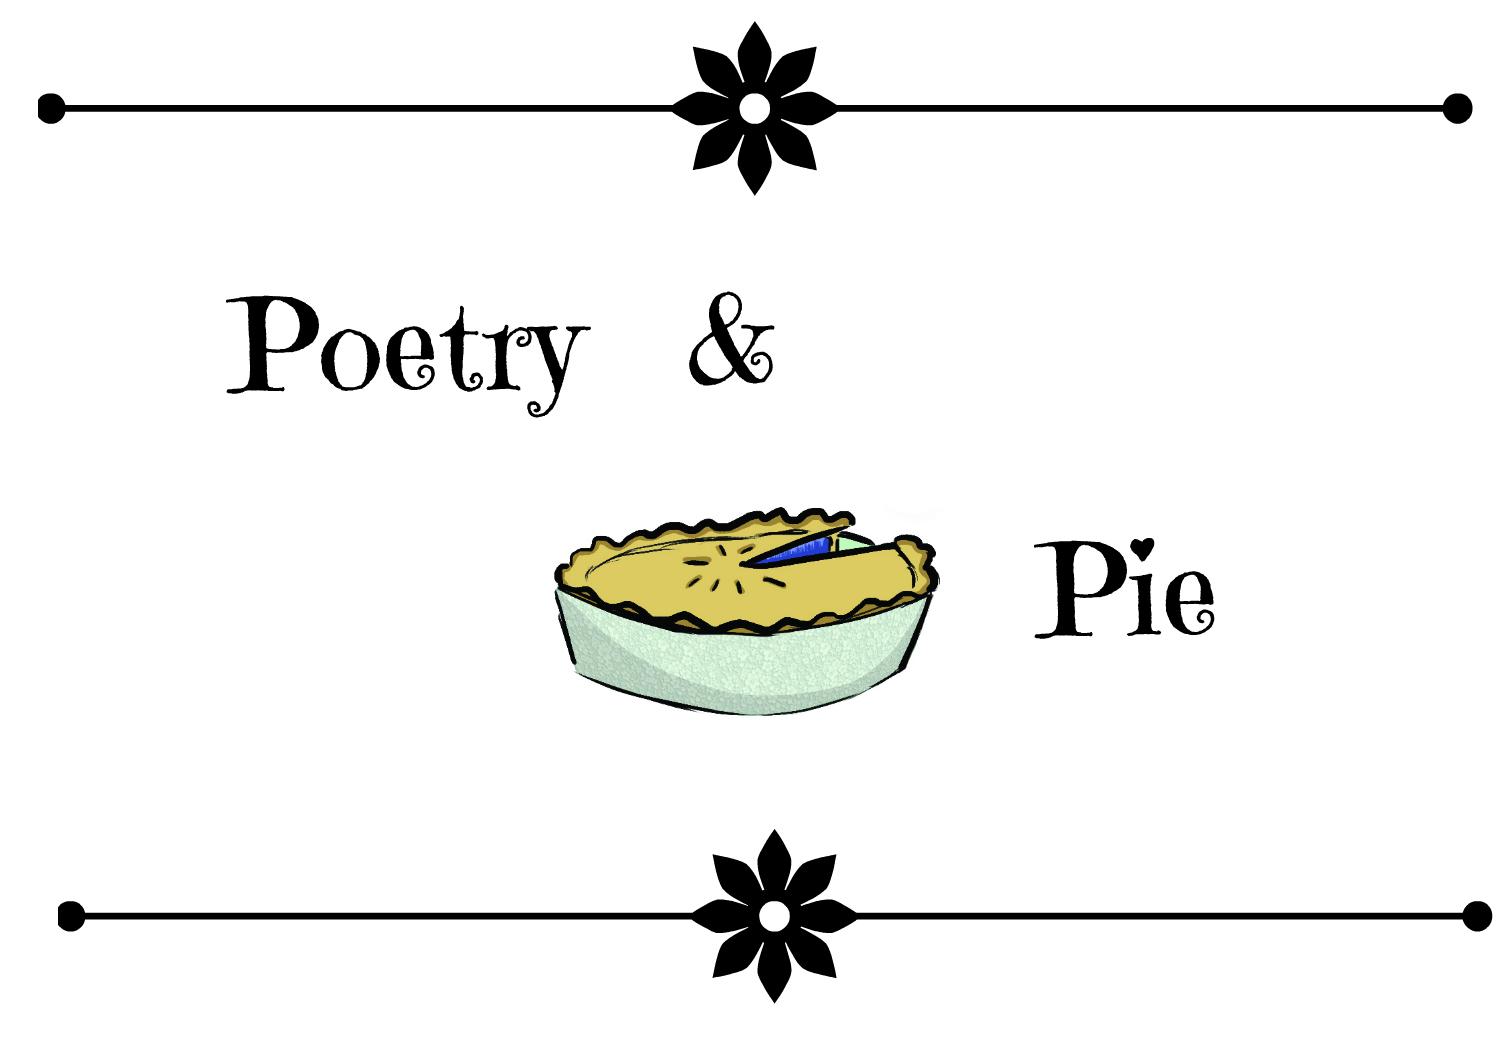 PoetryAndPie